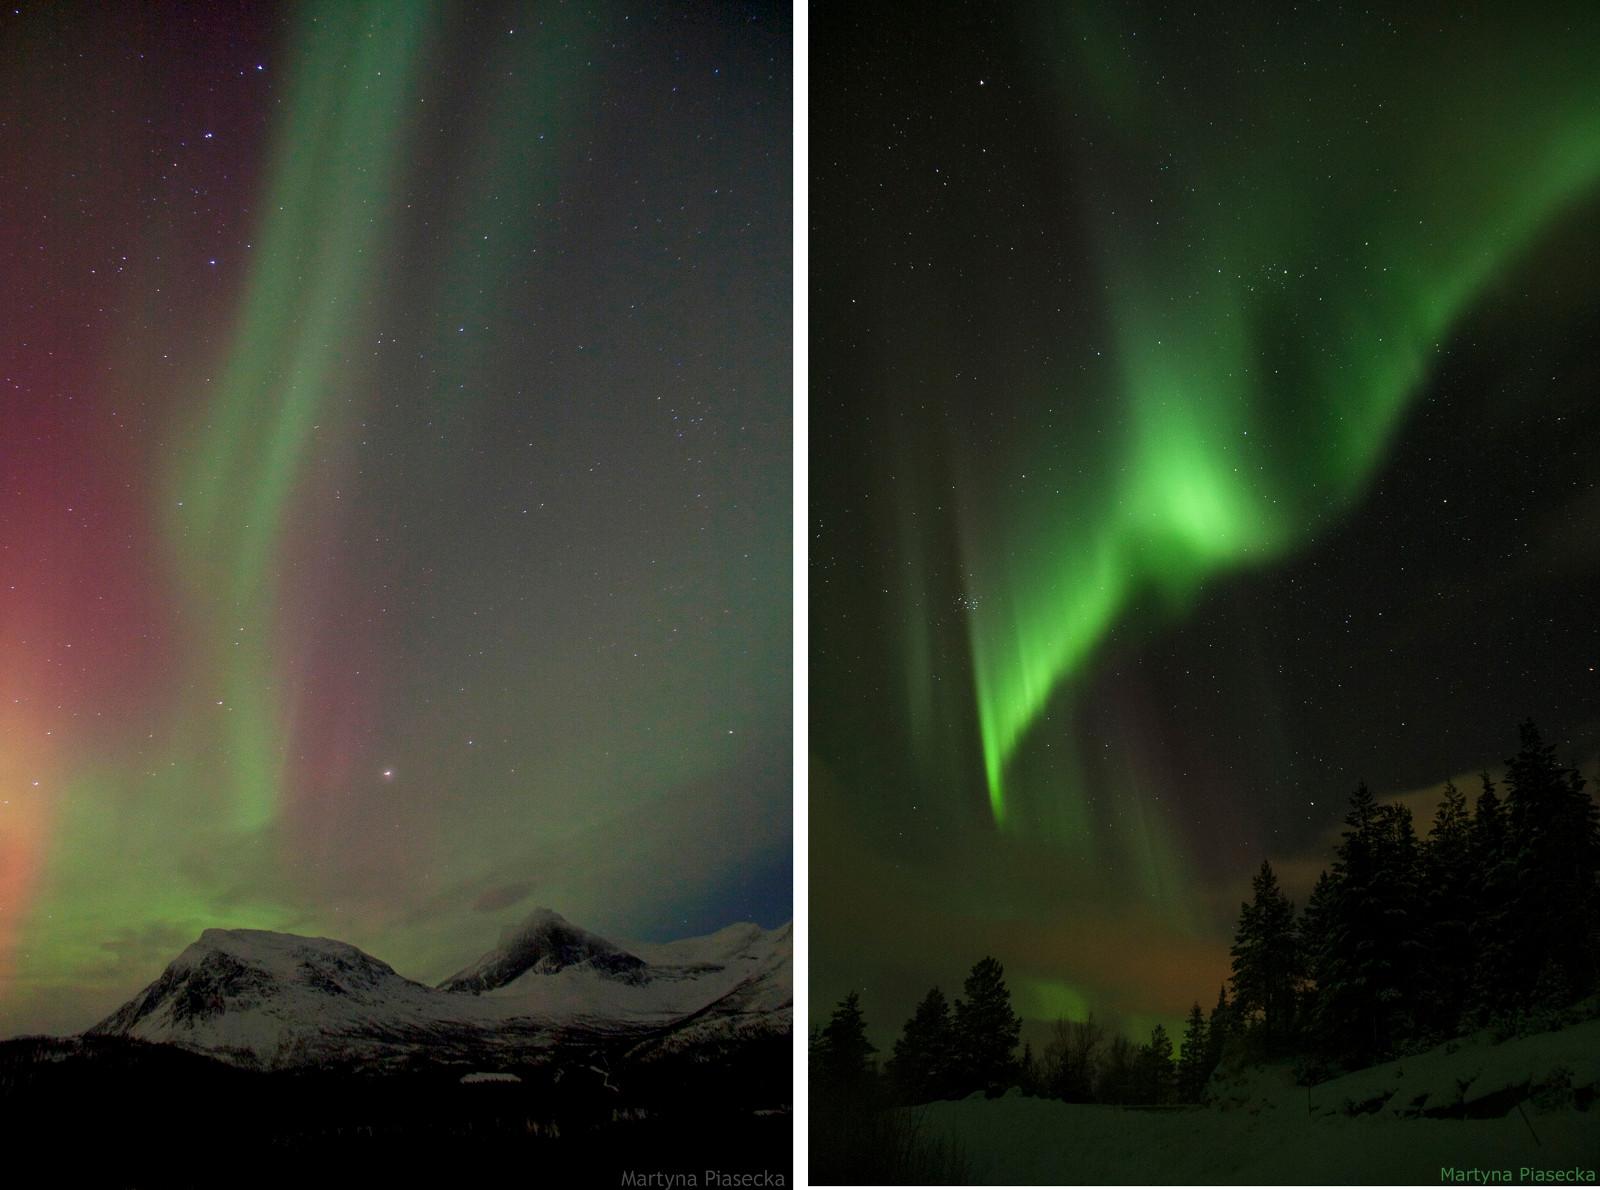 NORWEGIA, Kobbvatnet, zorza polarna - foto